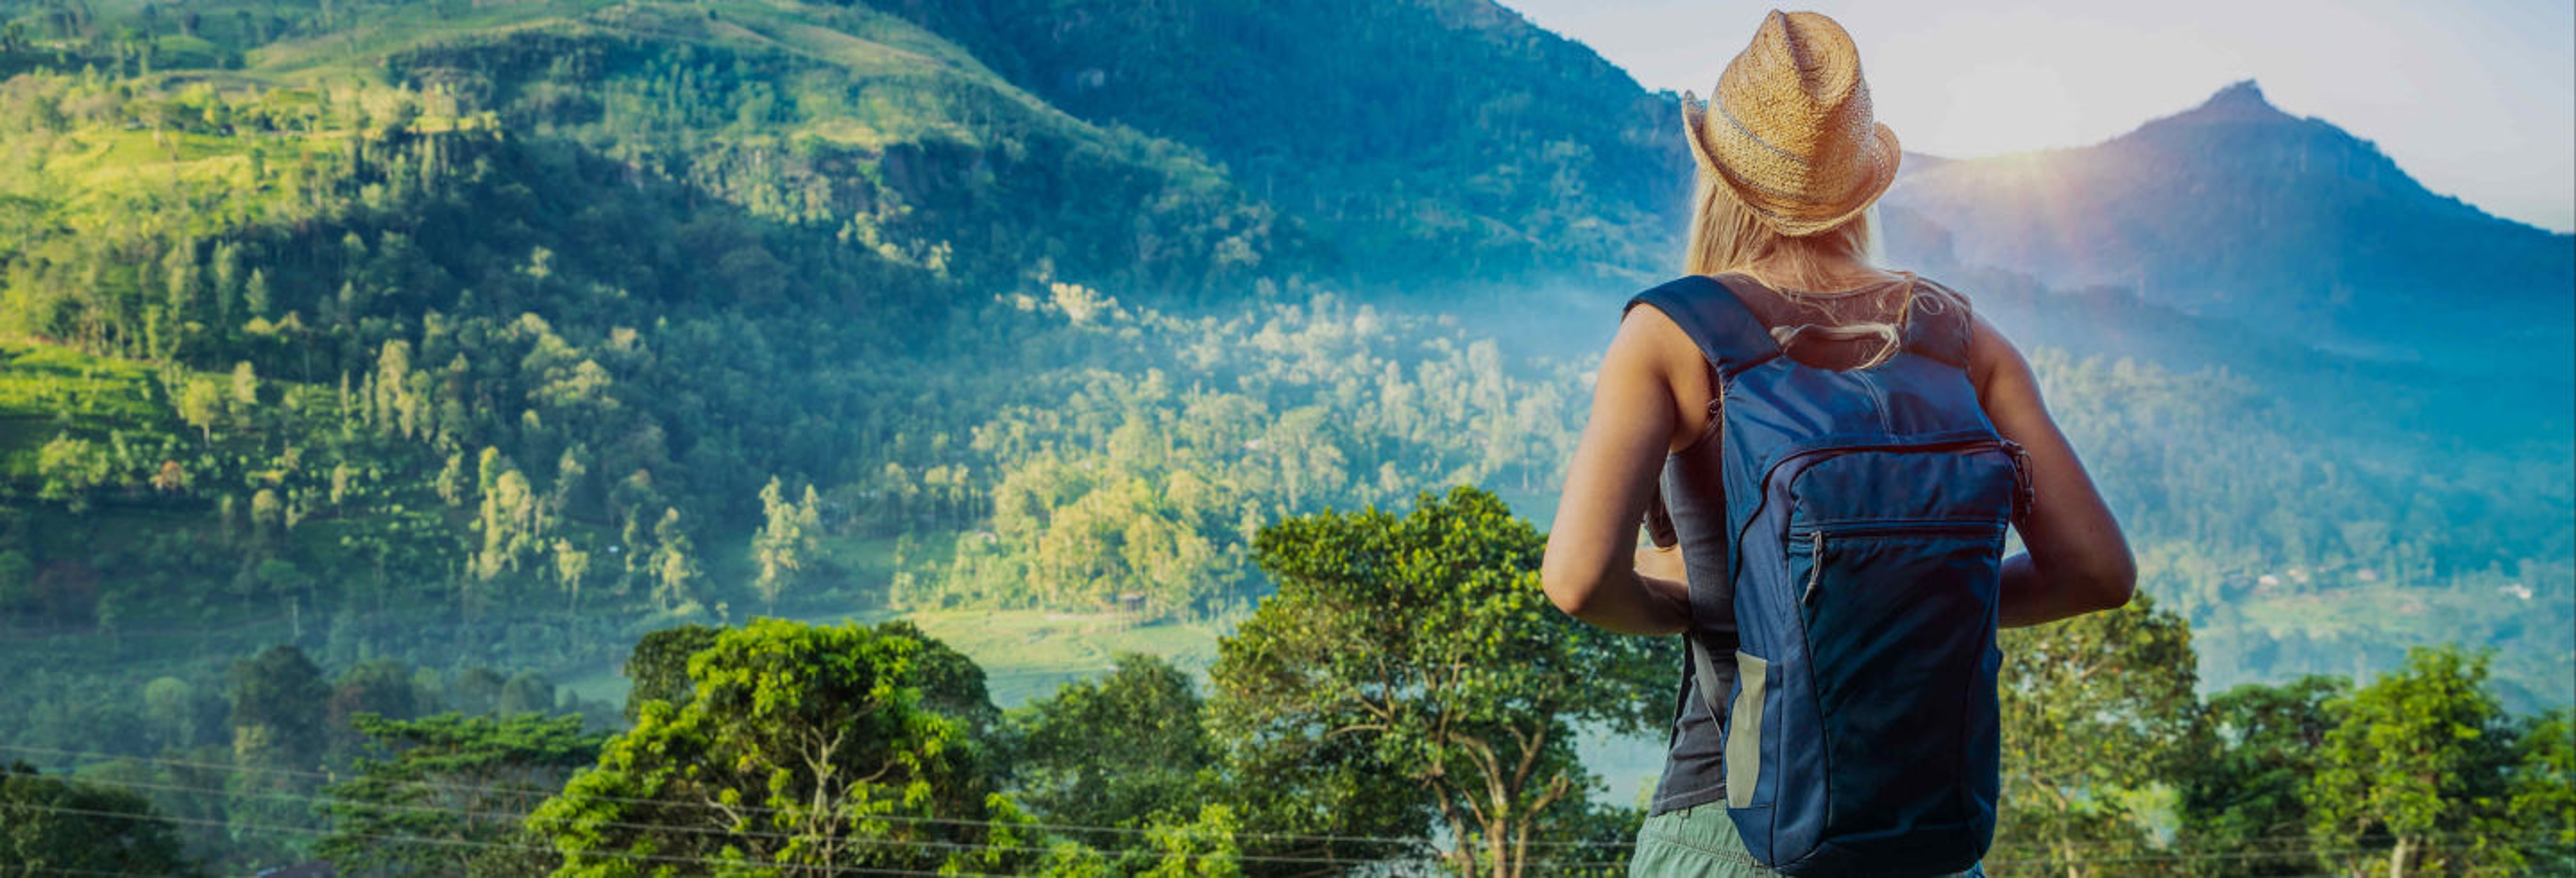 Tour privado de 2 días por Nuwara Eliya y Ambuluwawa